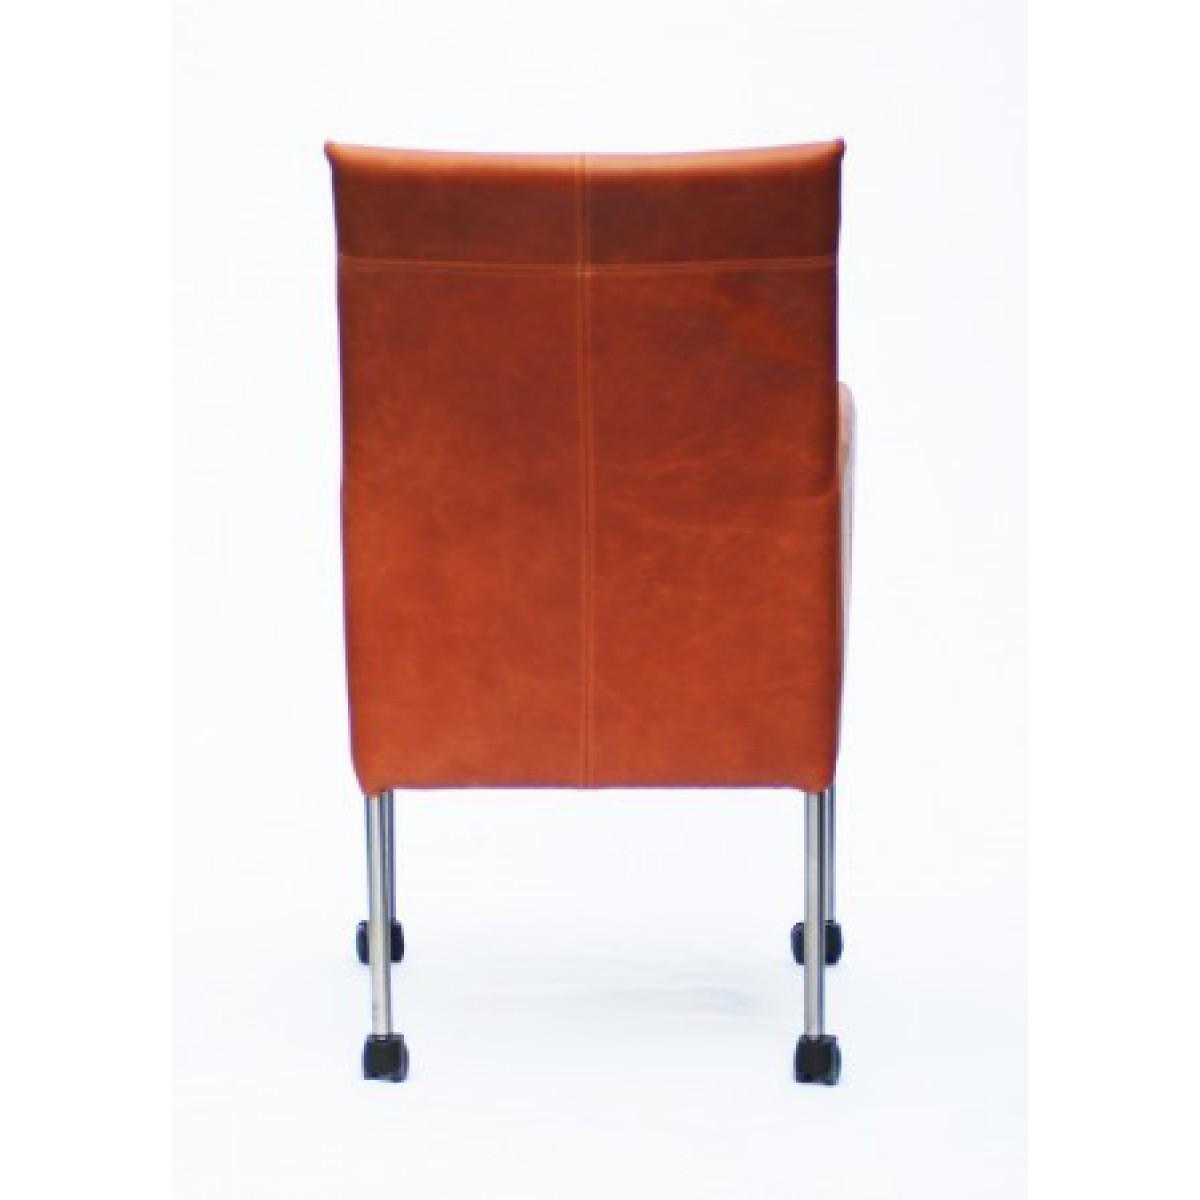 viton-eetkamerstoel-op-wielen-he-design-leder-achterkant